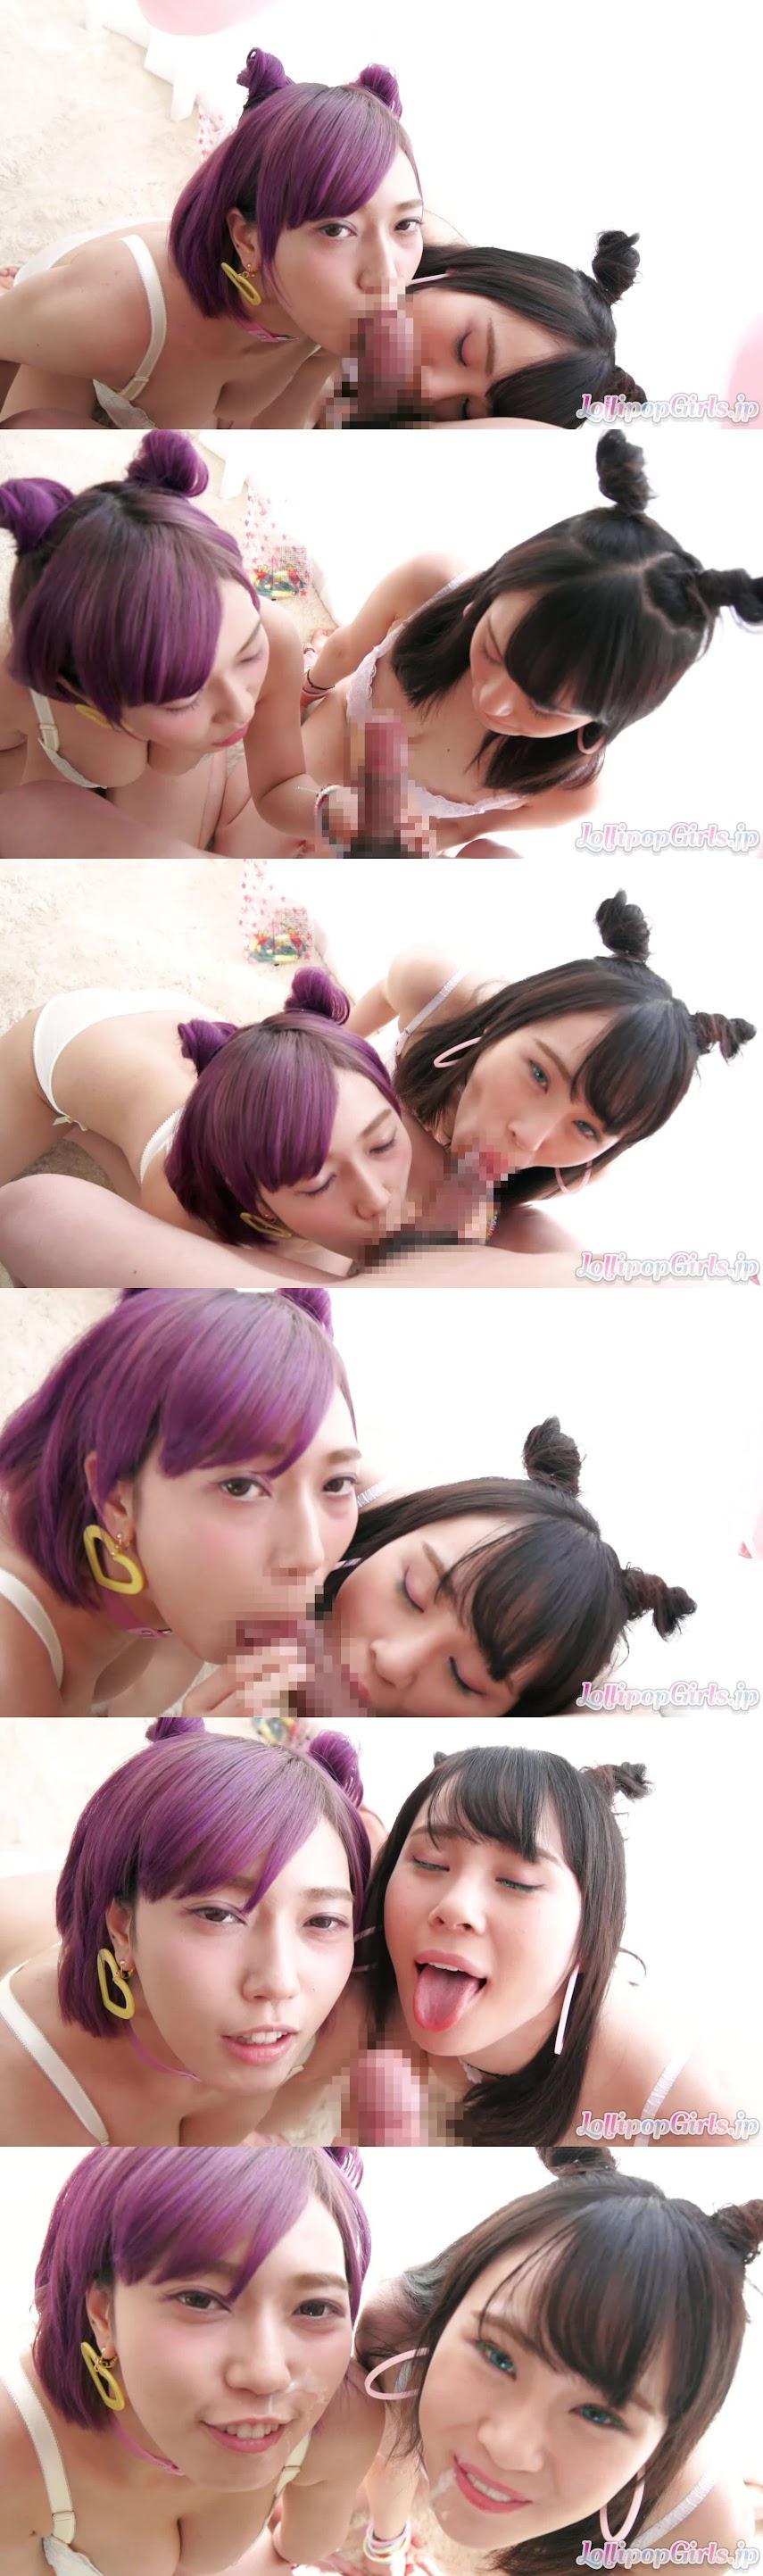 LollipopGirls ReinaFujikawa-YuzuKitagawa-16-1080p